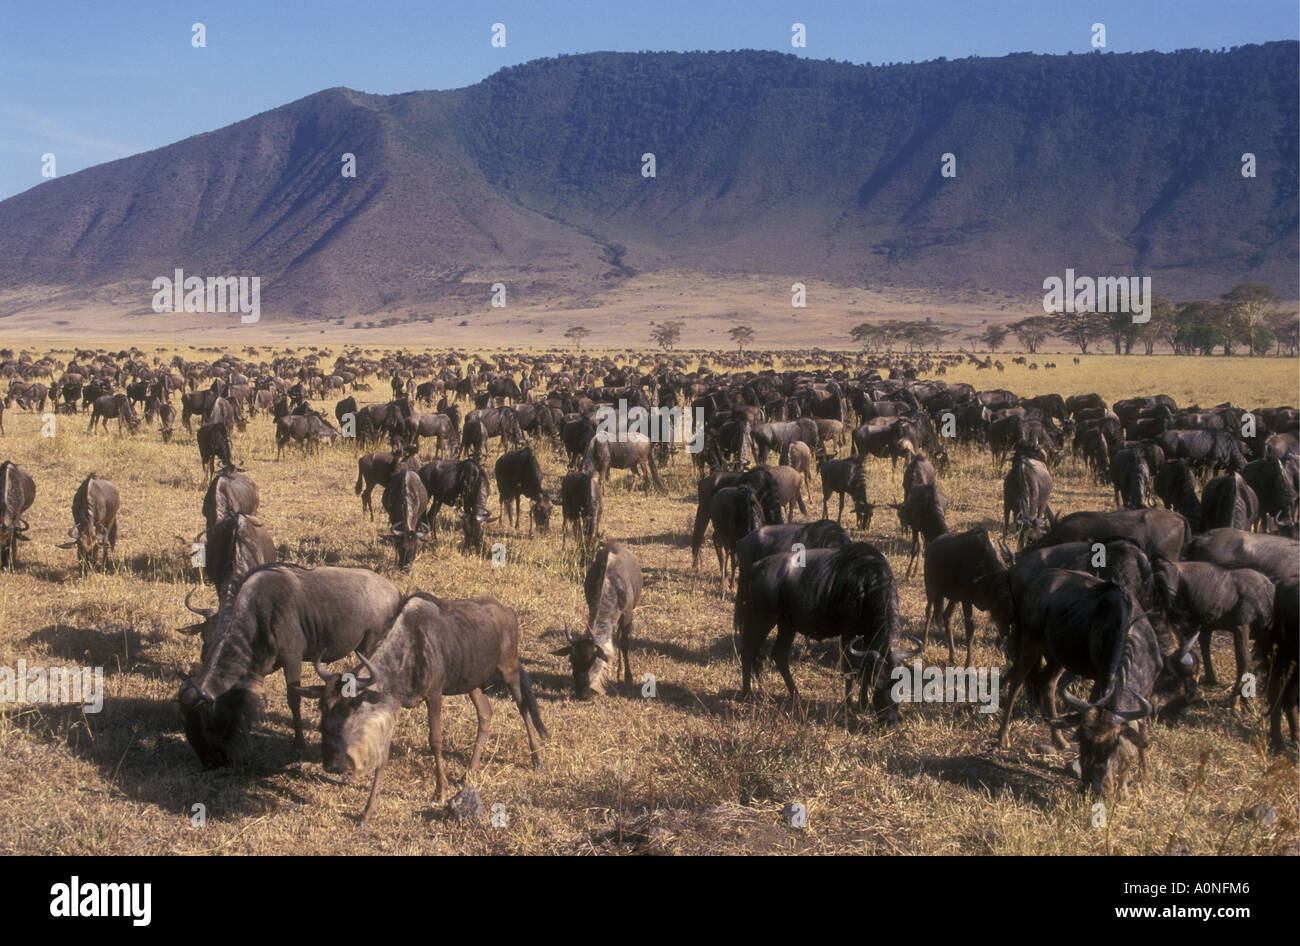 A herd of several thousand wildebeest Ngorongoro Crater Tanzania - Stock Image